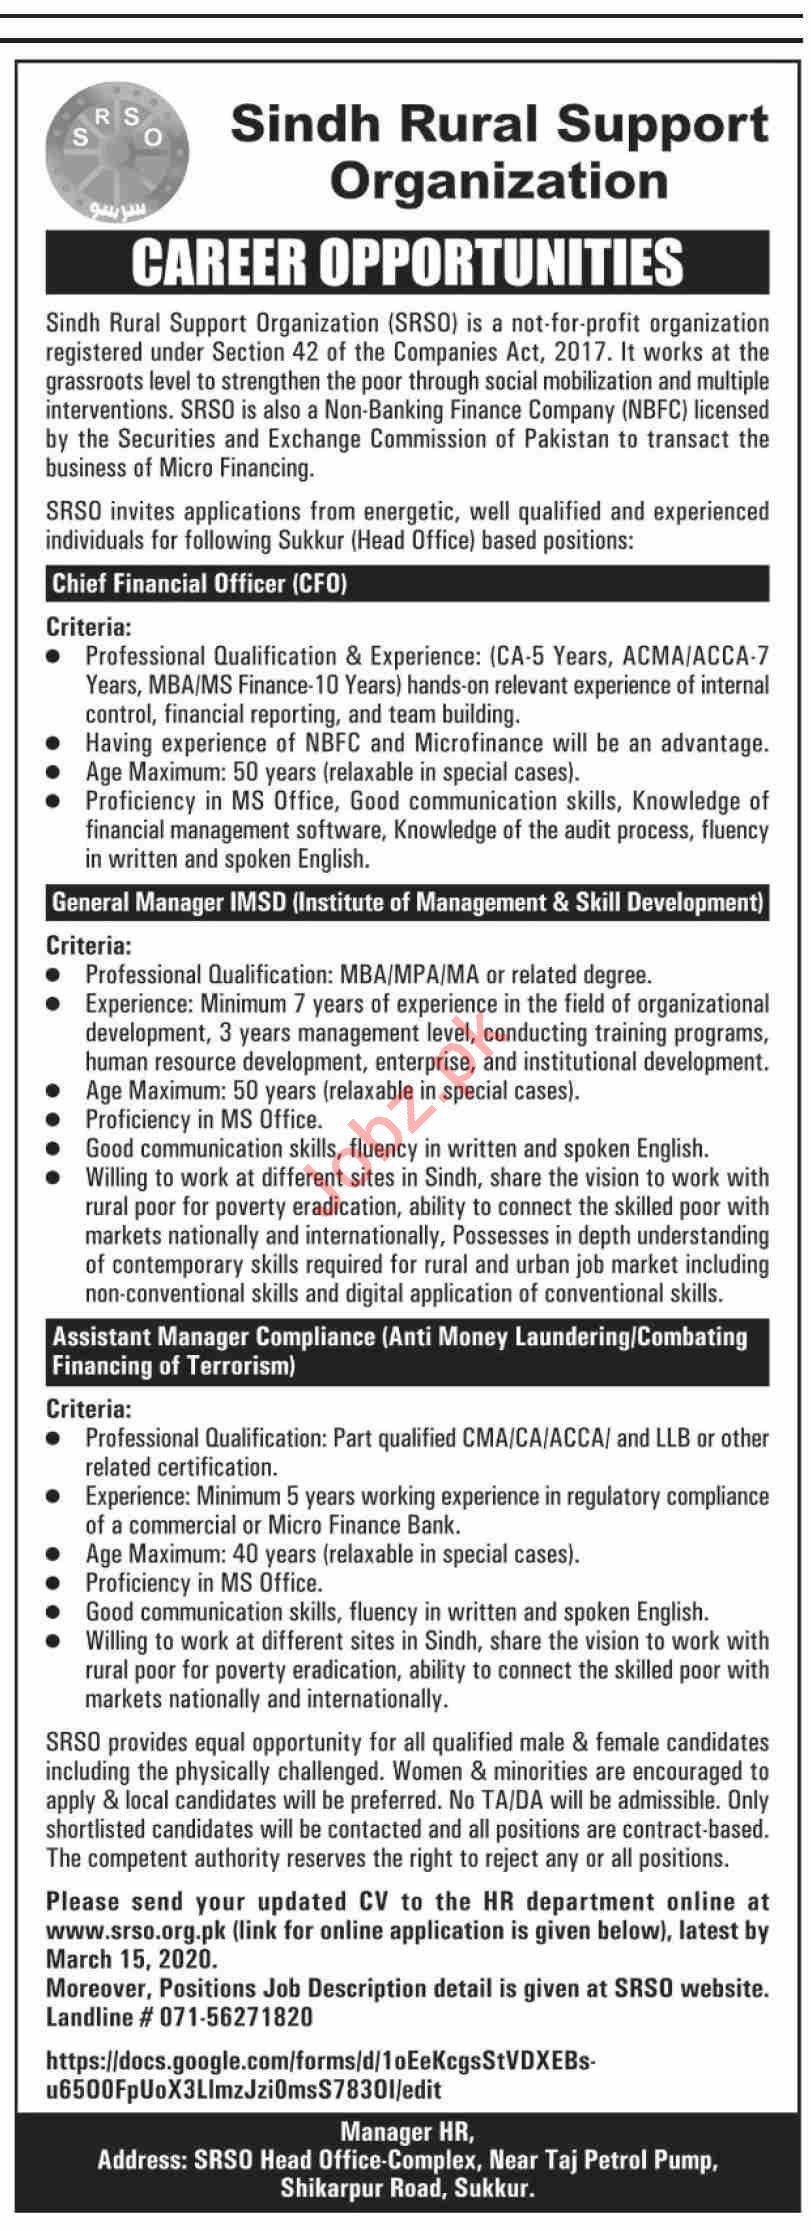 Sindh Rural Support Organization SRSO Jobs 2020